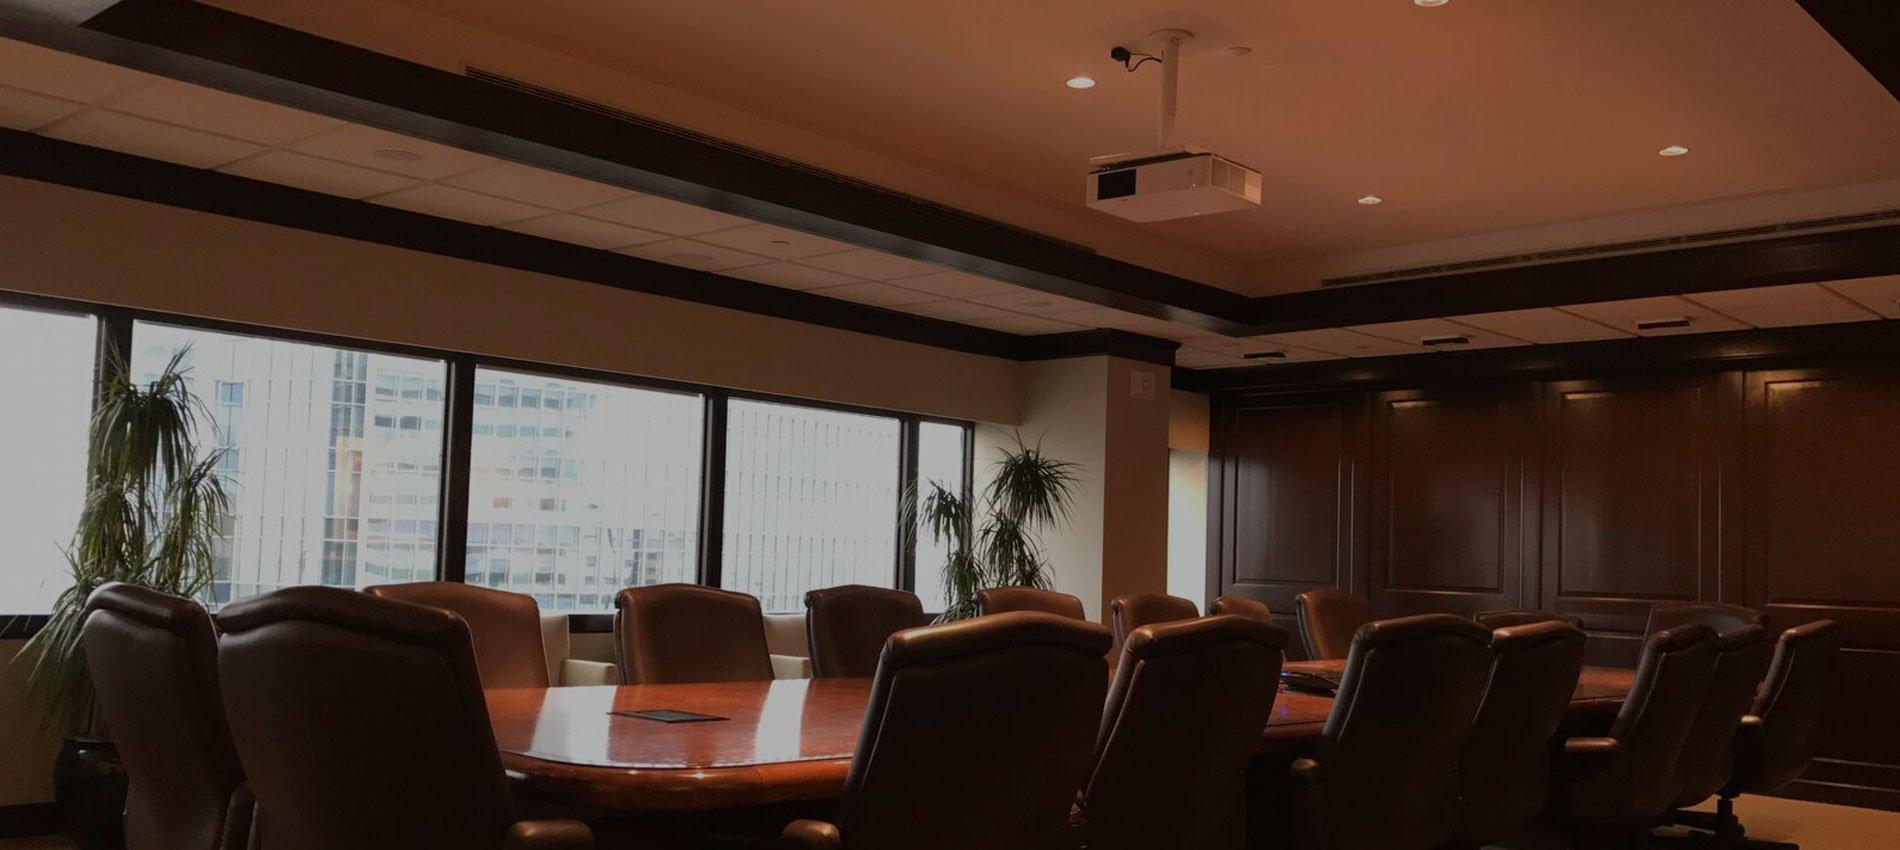 Conference Room Smart Systems For Oklahoma City Edmond Tulsa - Audi okc